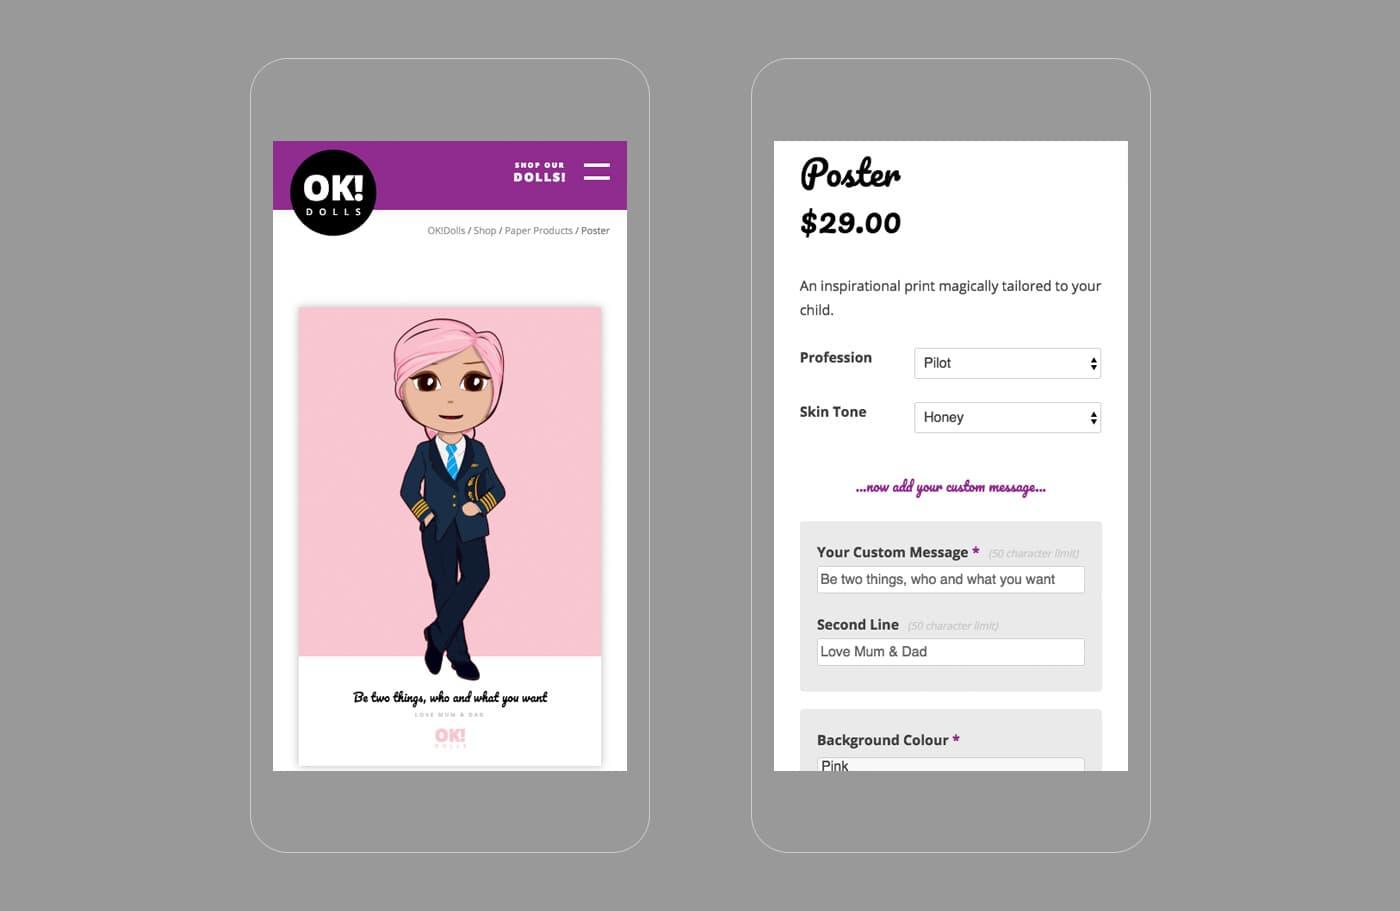 Custom Posters - mobile - OK!Dolls